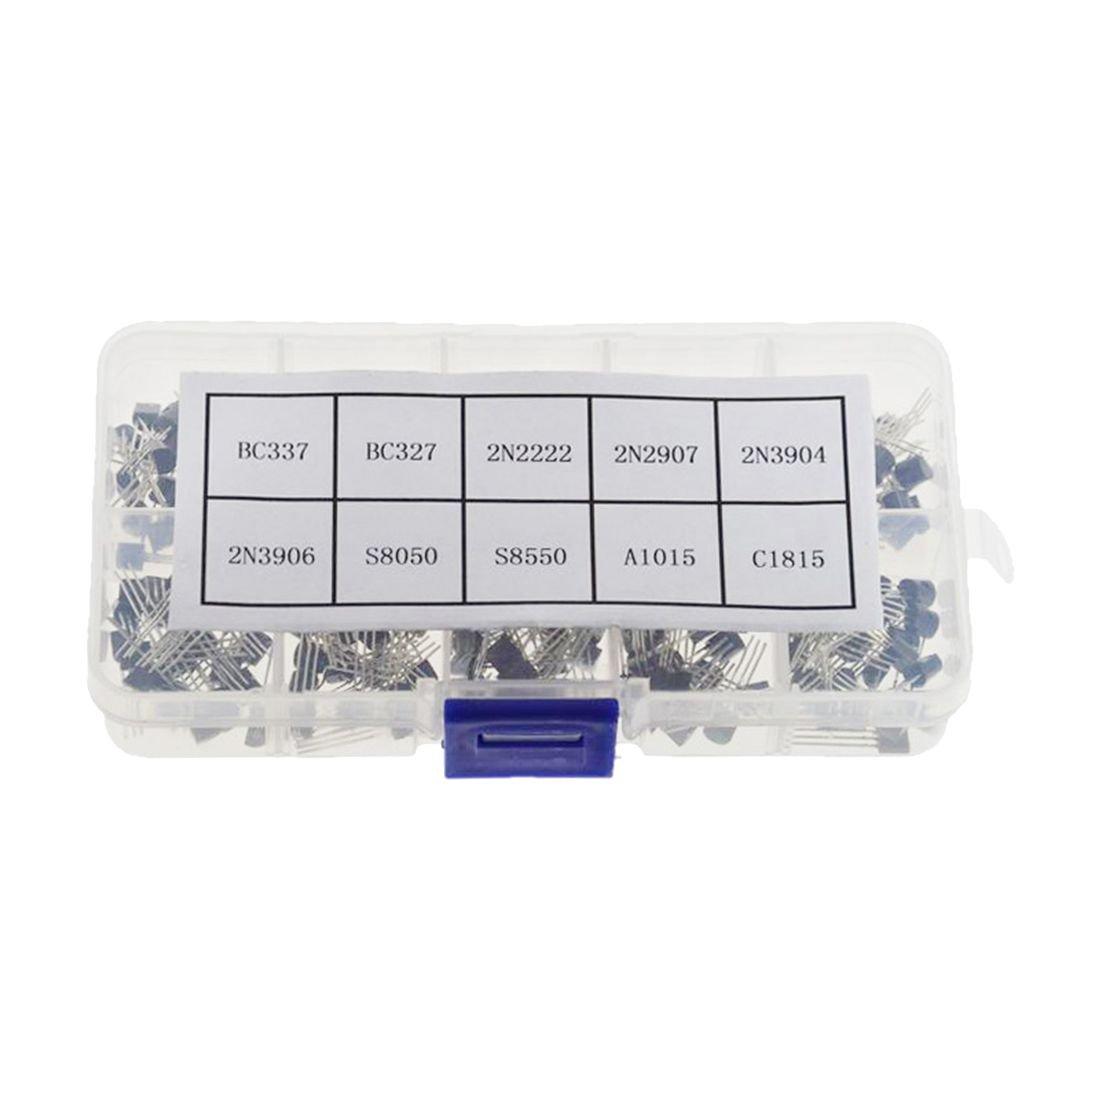 SODIAL(R) TO-92 Transistor Box BC337B / C327 / 2N2907 / S8050 / S8550NPNPNP10 Total 200 130871